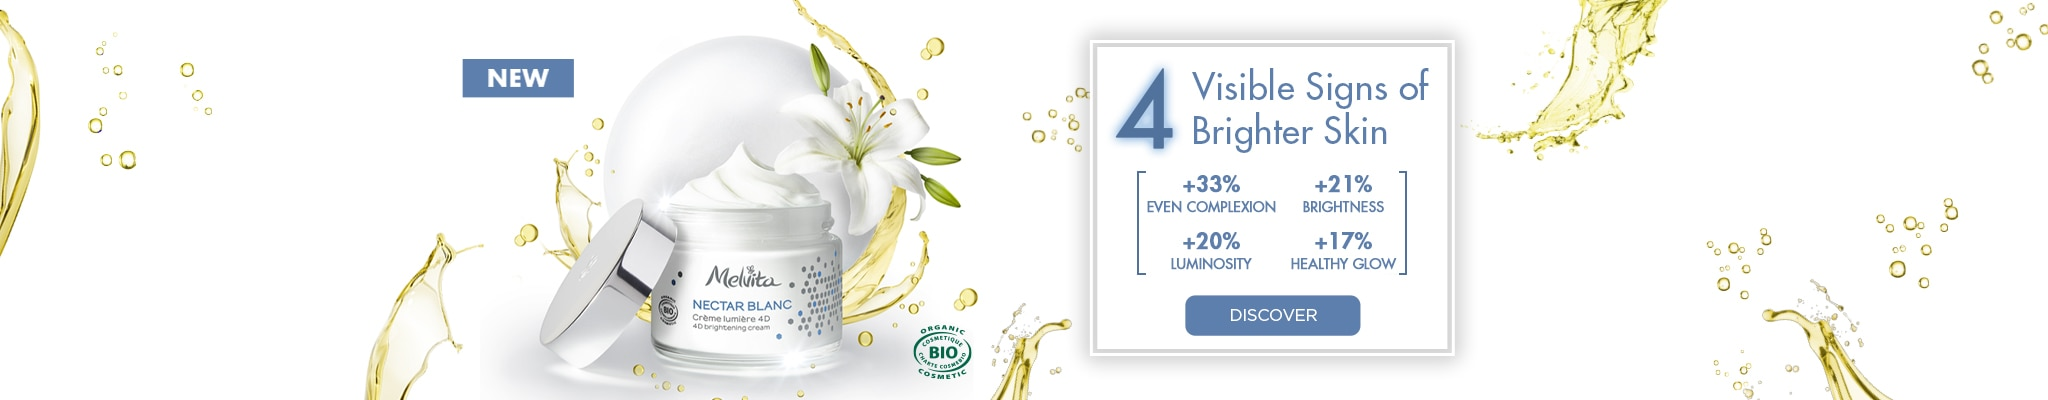 Nectar Blanc 4D Brightening Cream